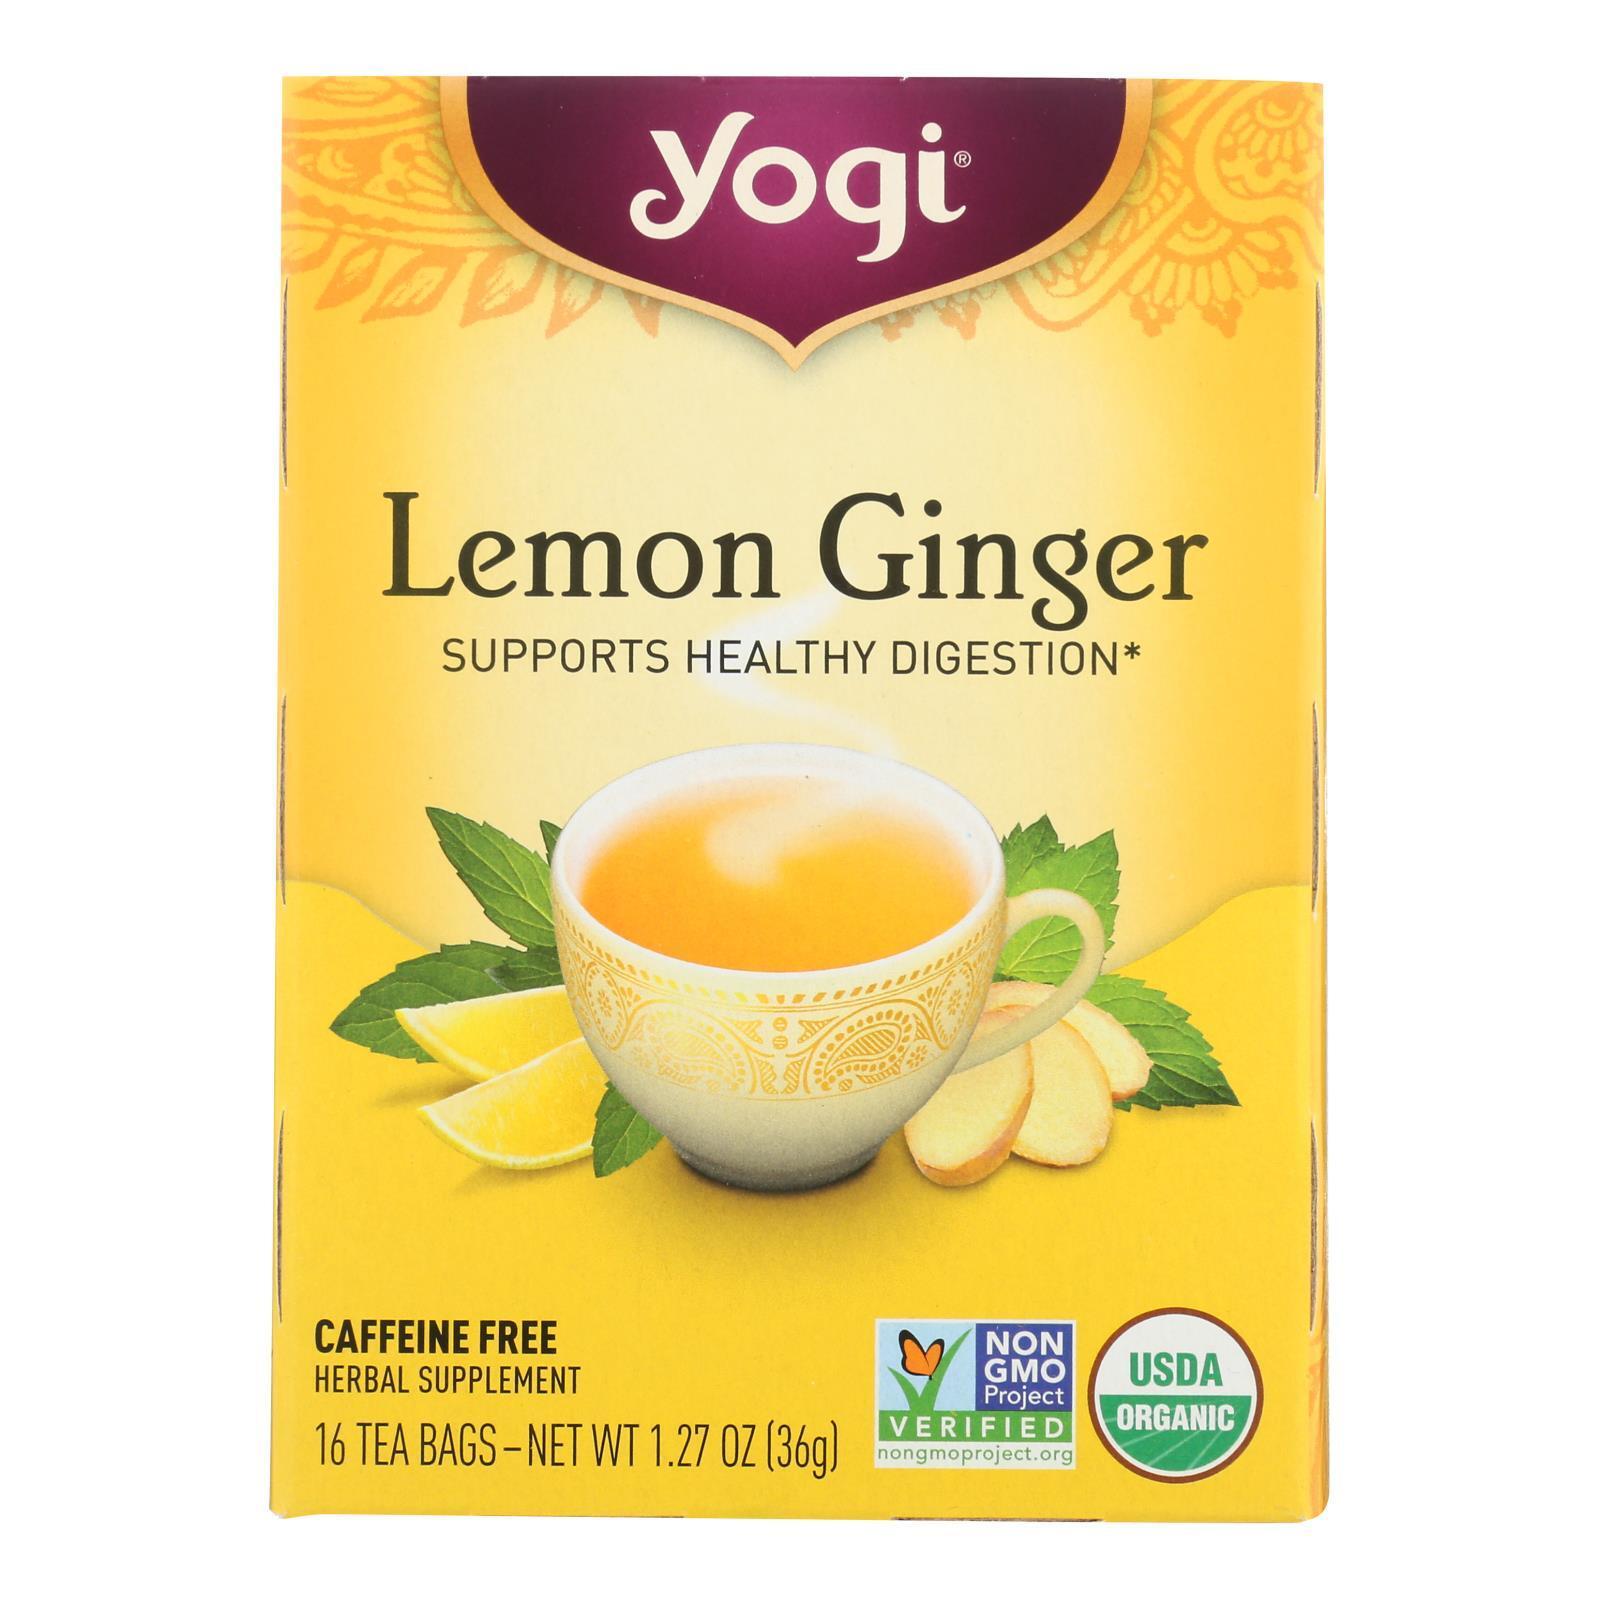 Yogi Tea Lemon Ginger - Caffeine Free - 16 Tea Bags